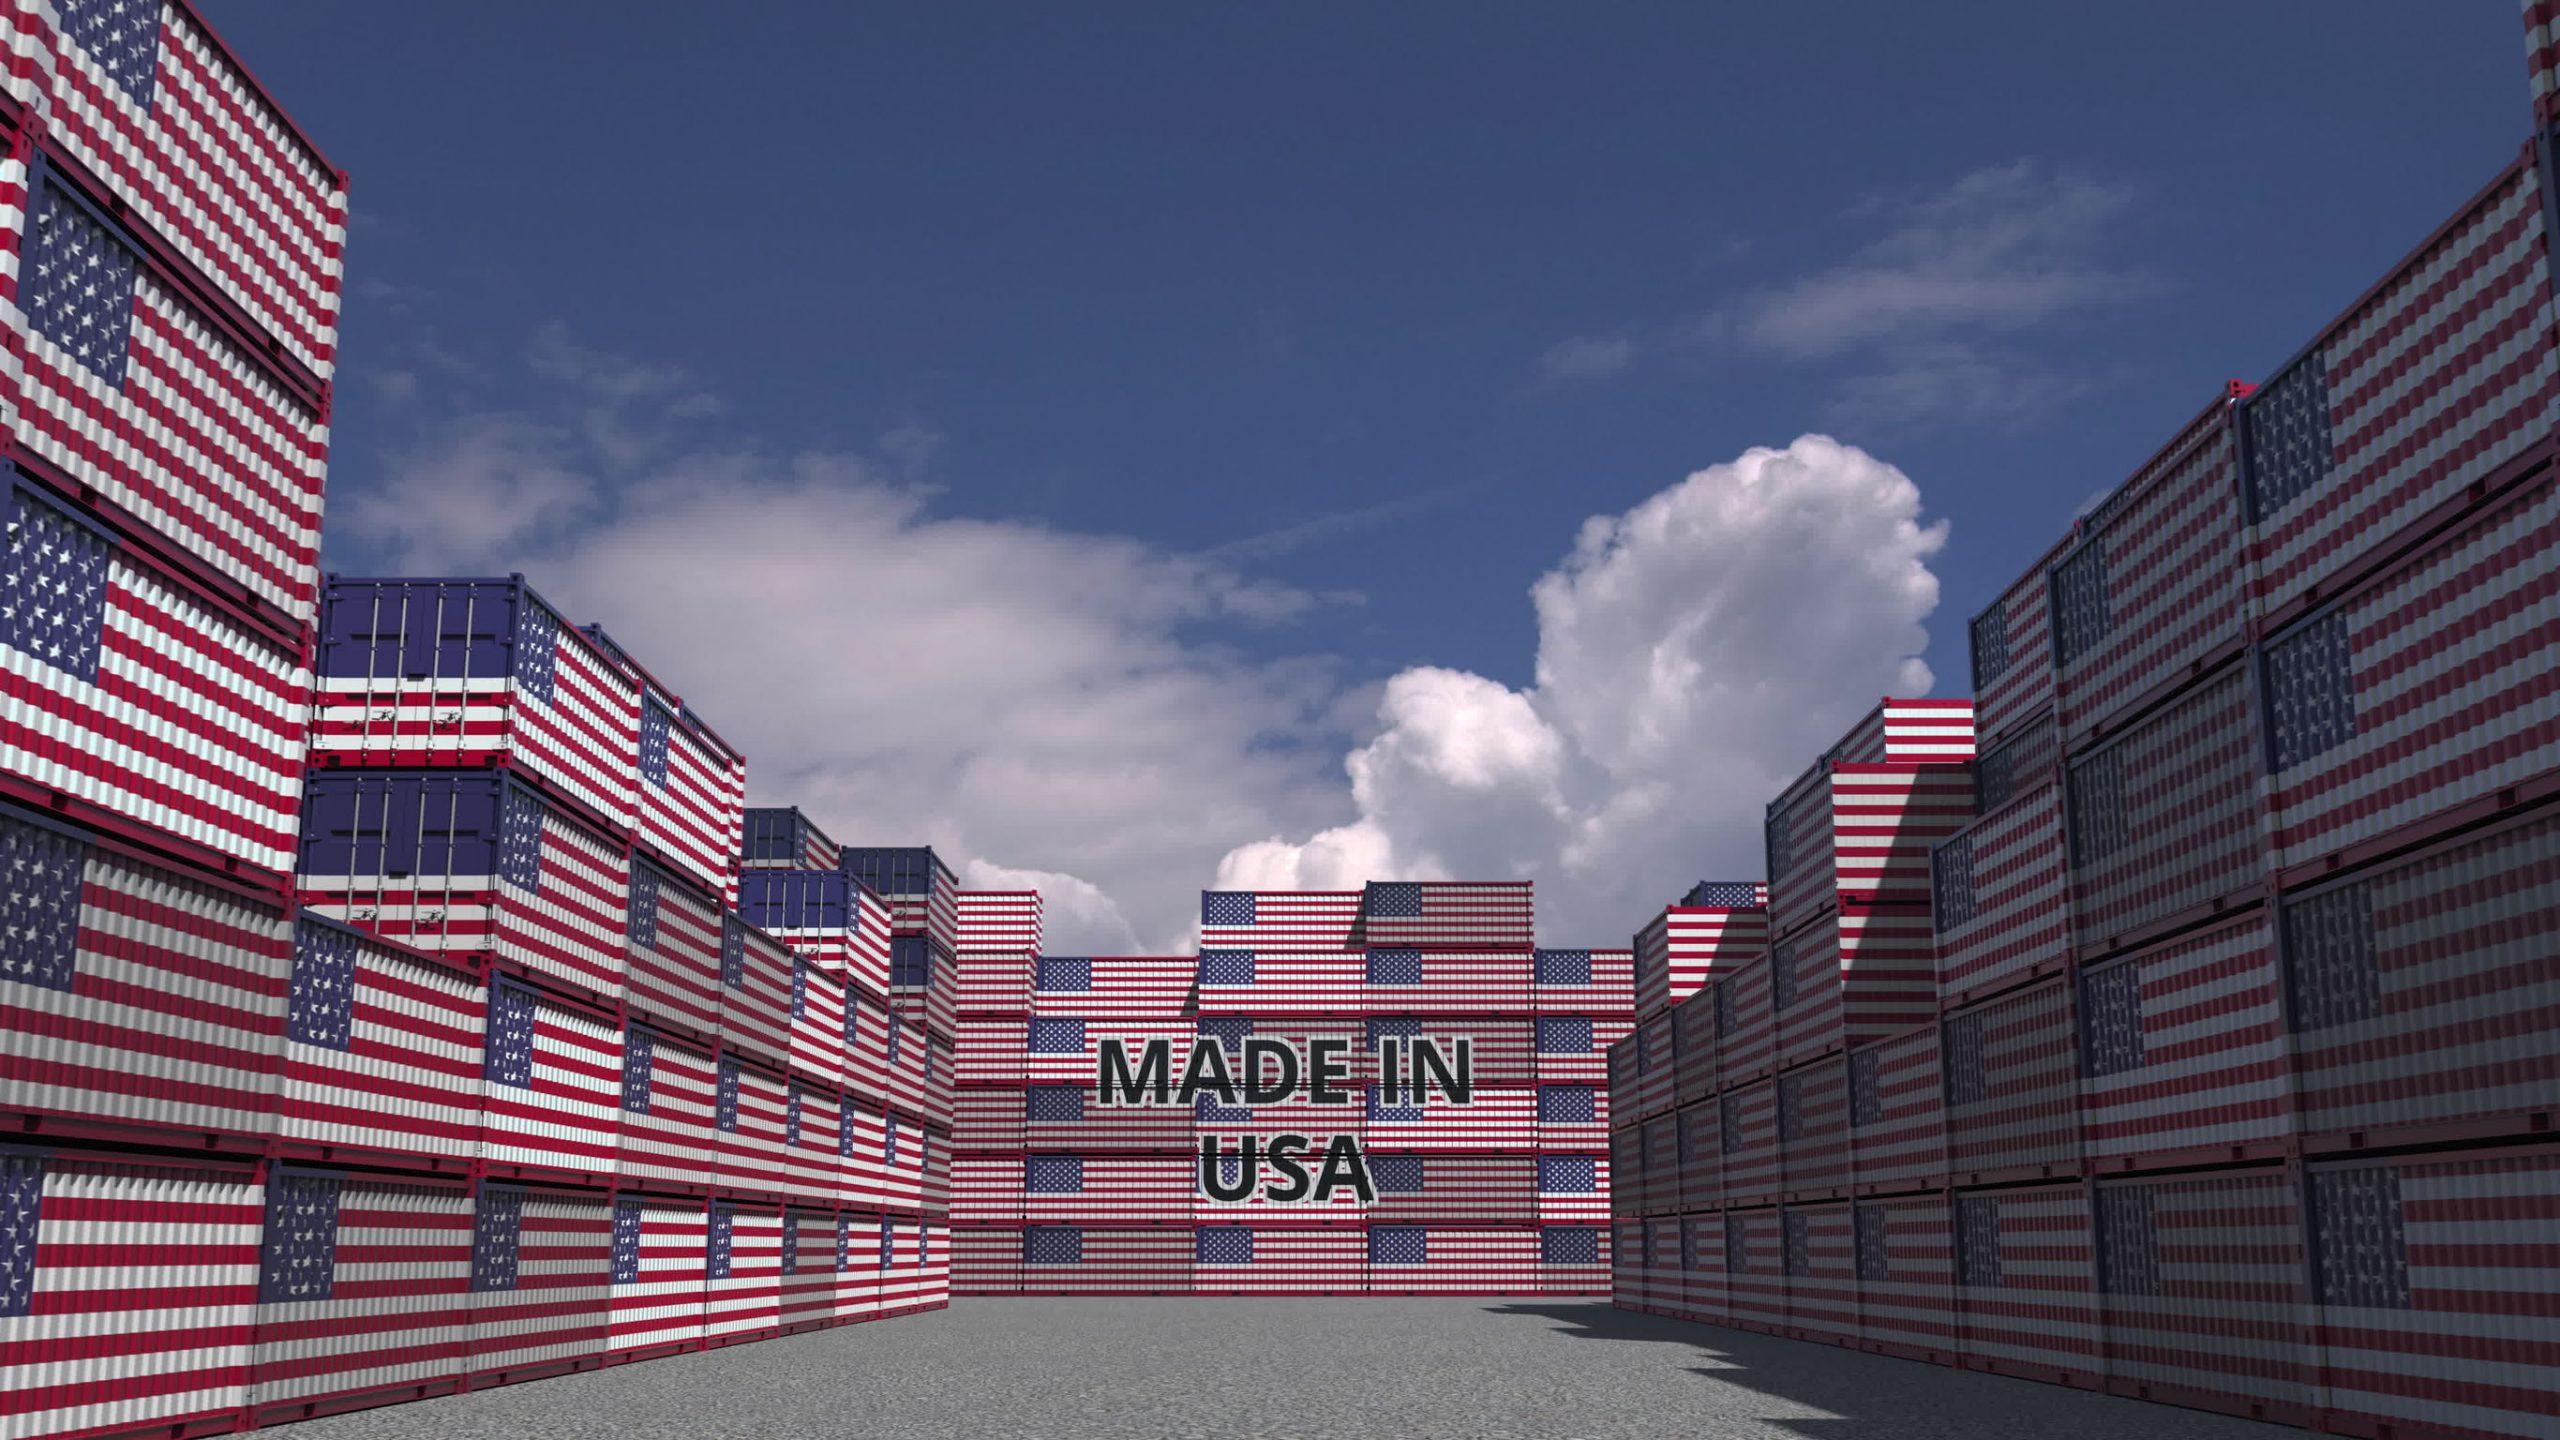 Machinists Union Will Fight Midnight Raid on U.S. Domestic Content Rules